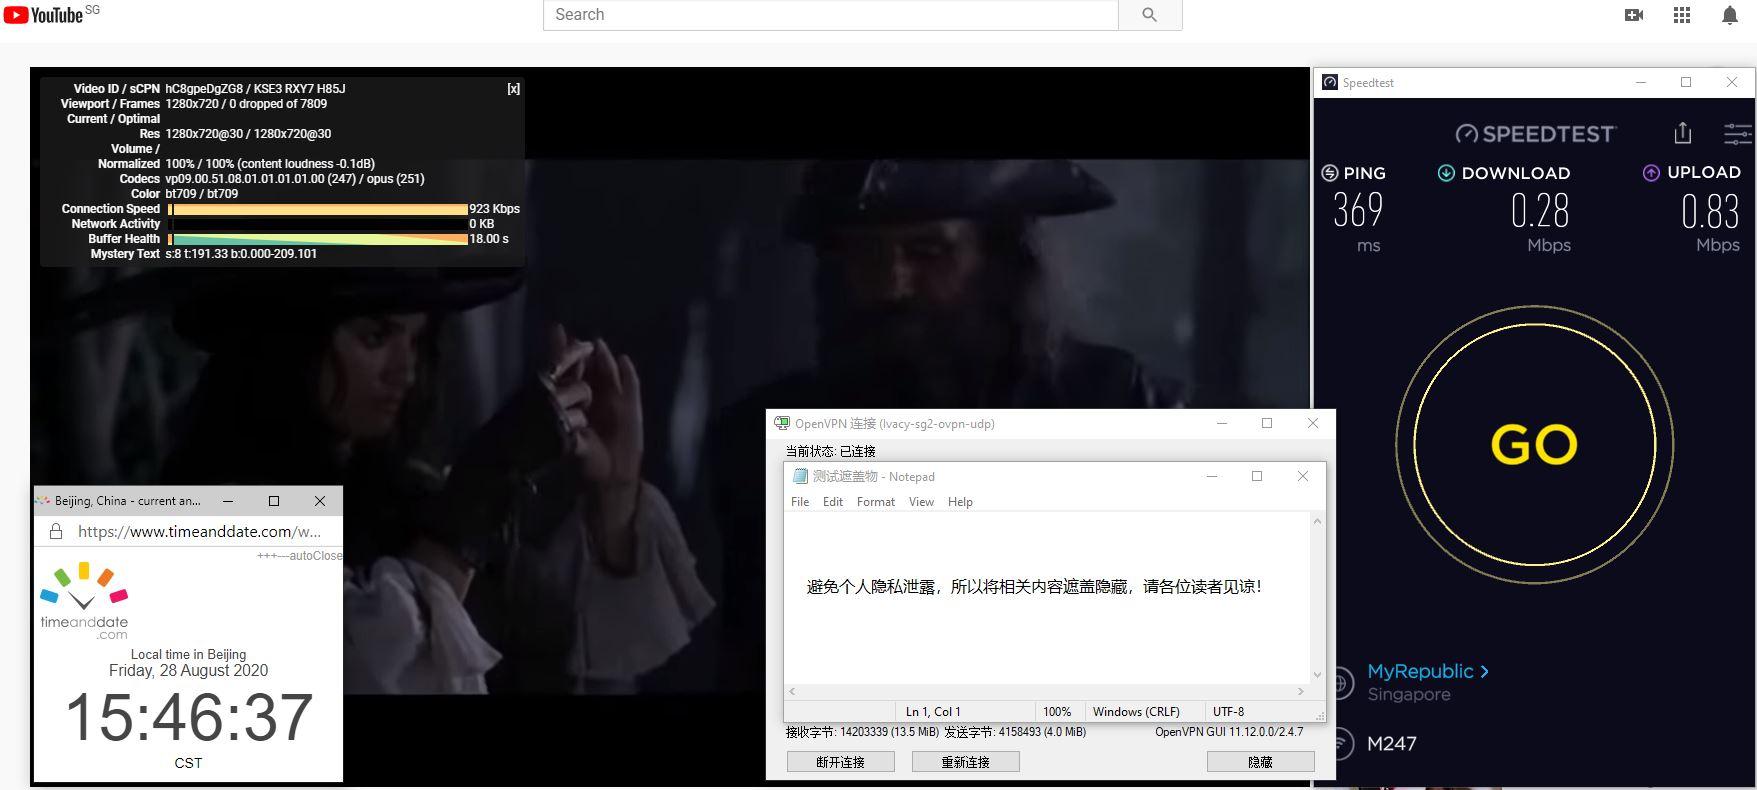 Windows10 IvacyVPN OpenVPN GUI sg2 中国VPN 翻墙 科学上网 翻墙速度测试 - 20200828